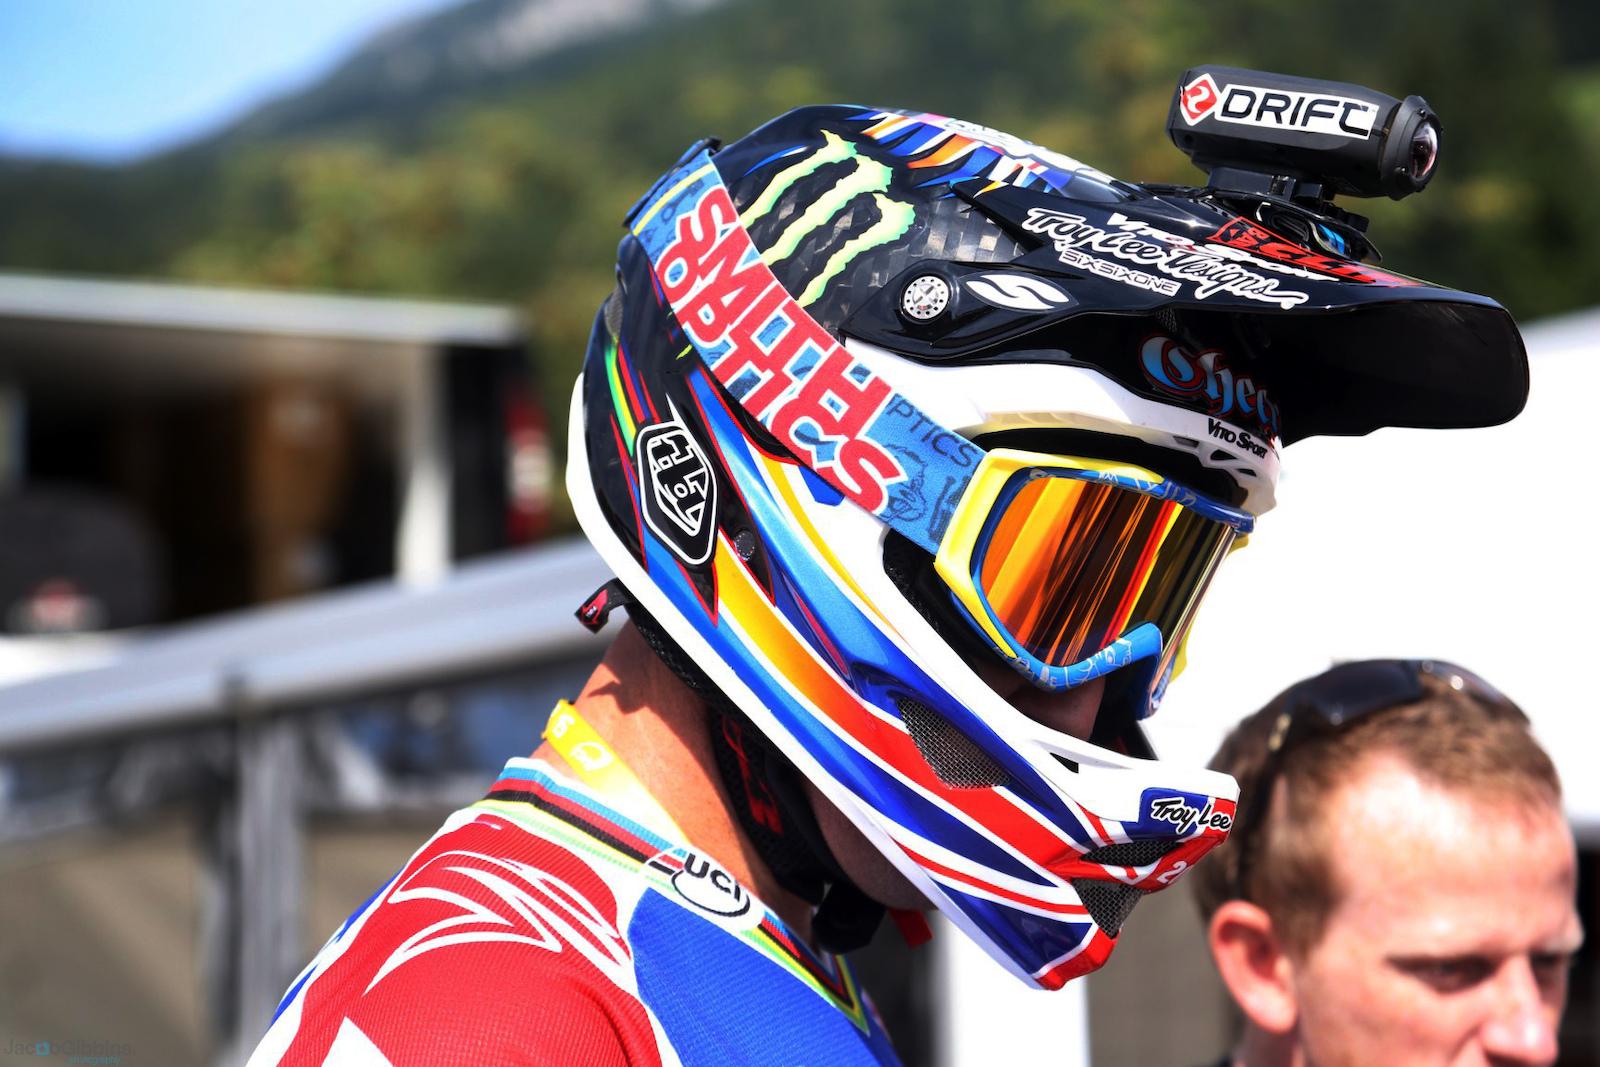 Steve Peat's 2012 World Champs bike - image by Jacob Gibbons